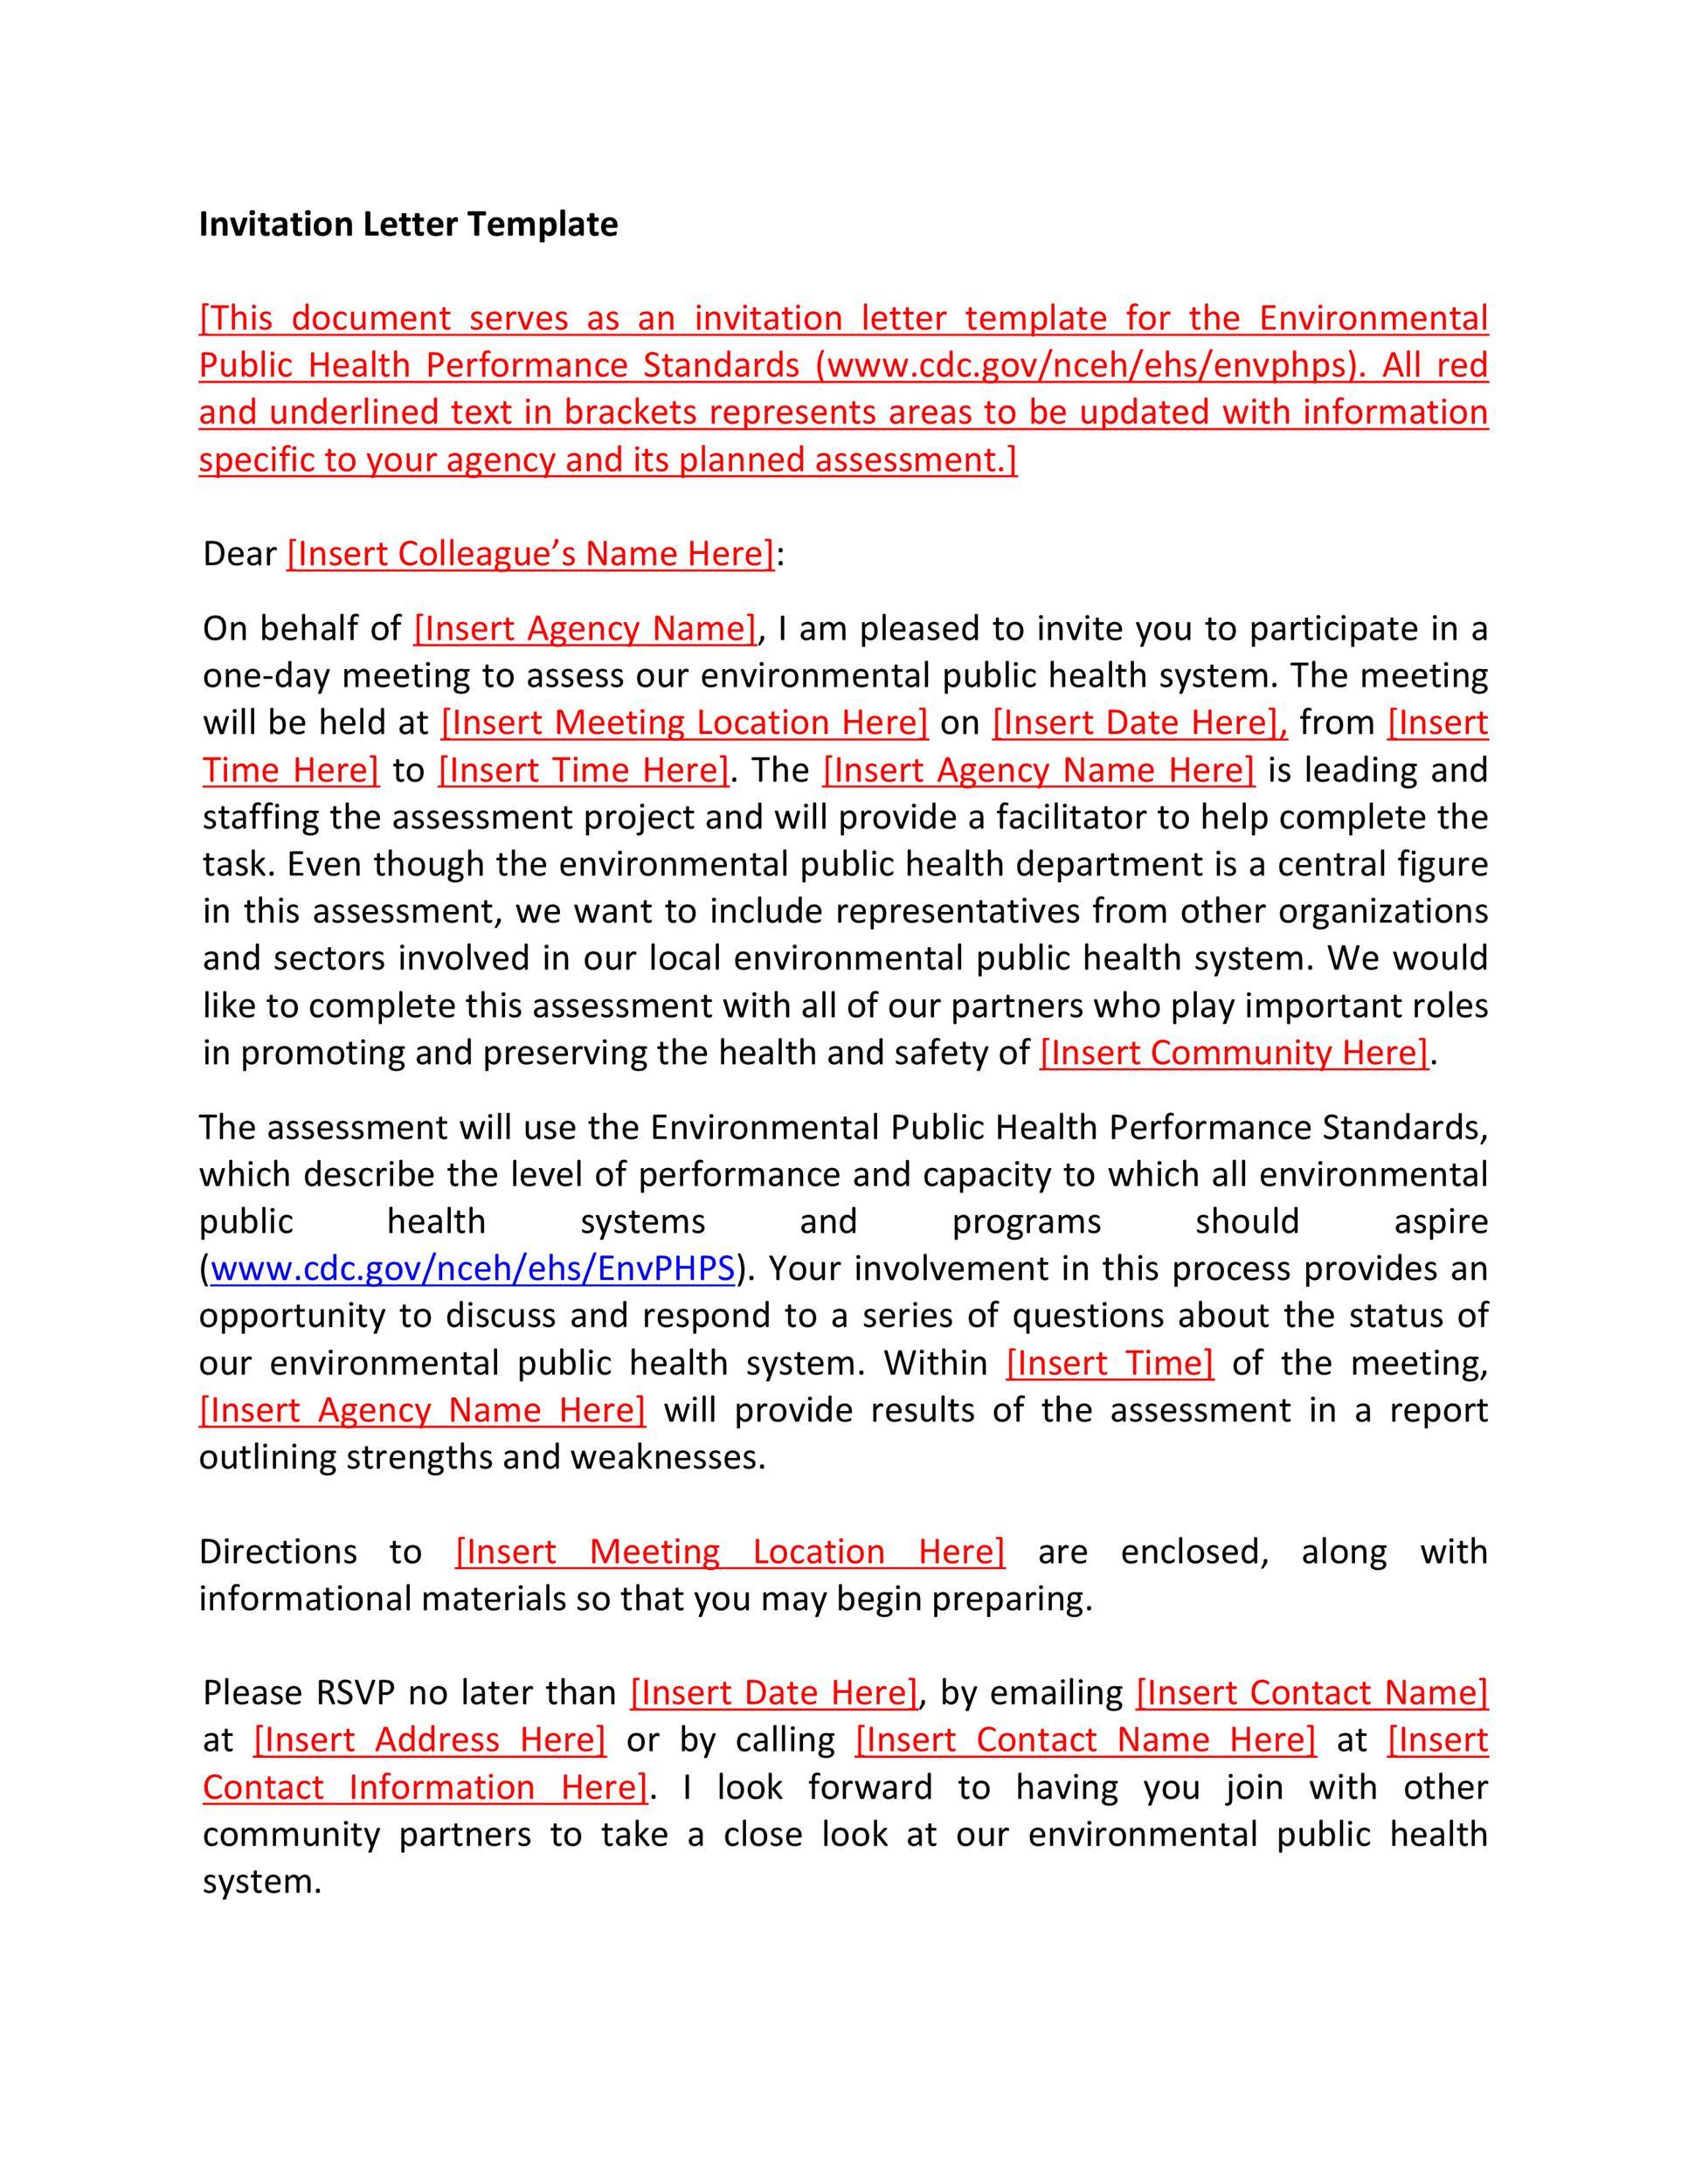 Free invitation letter 08